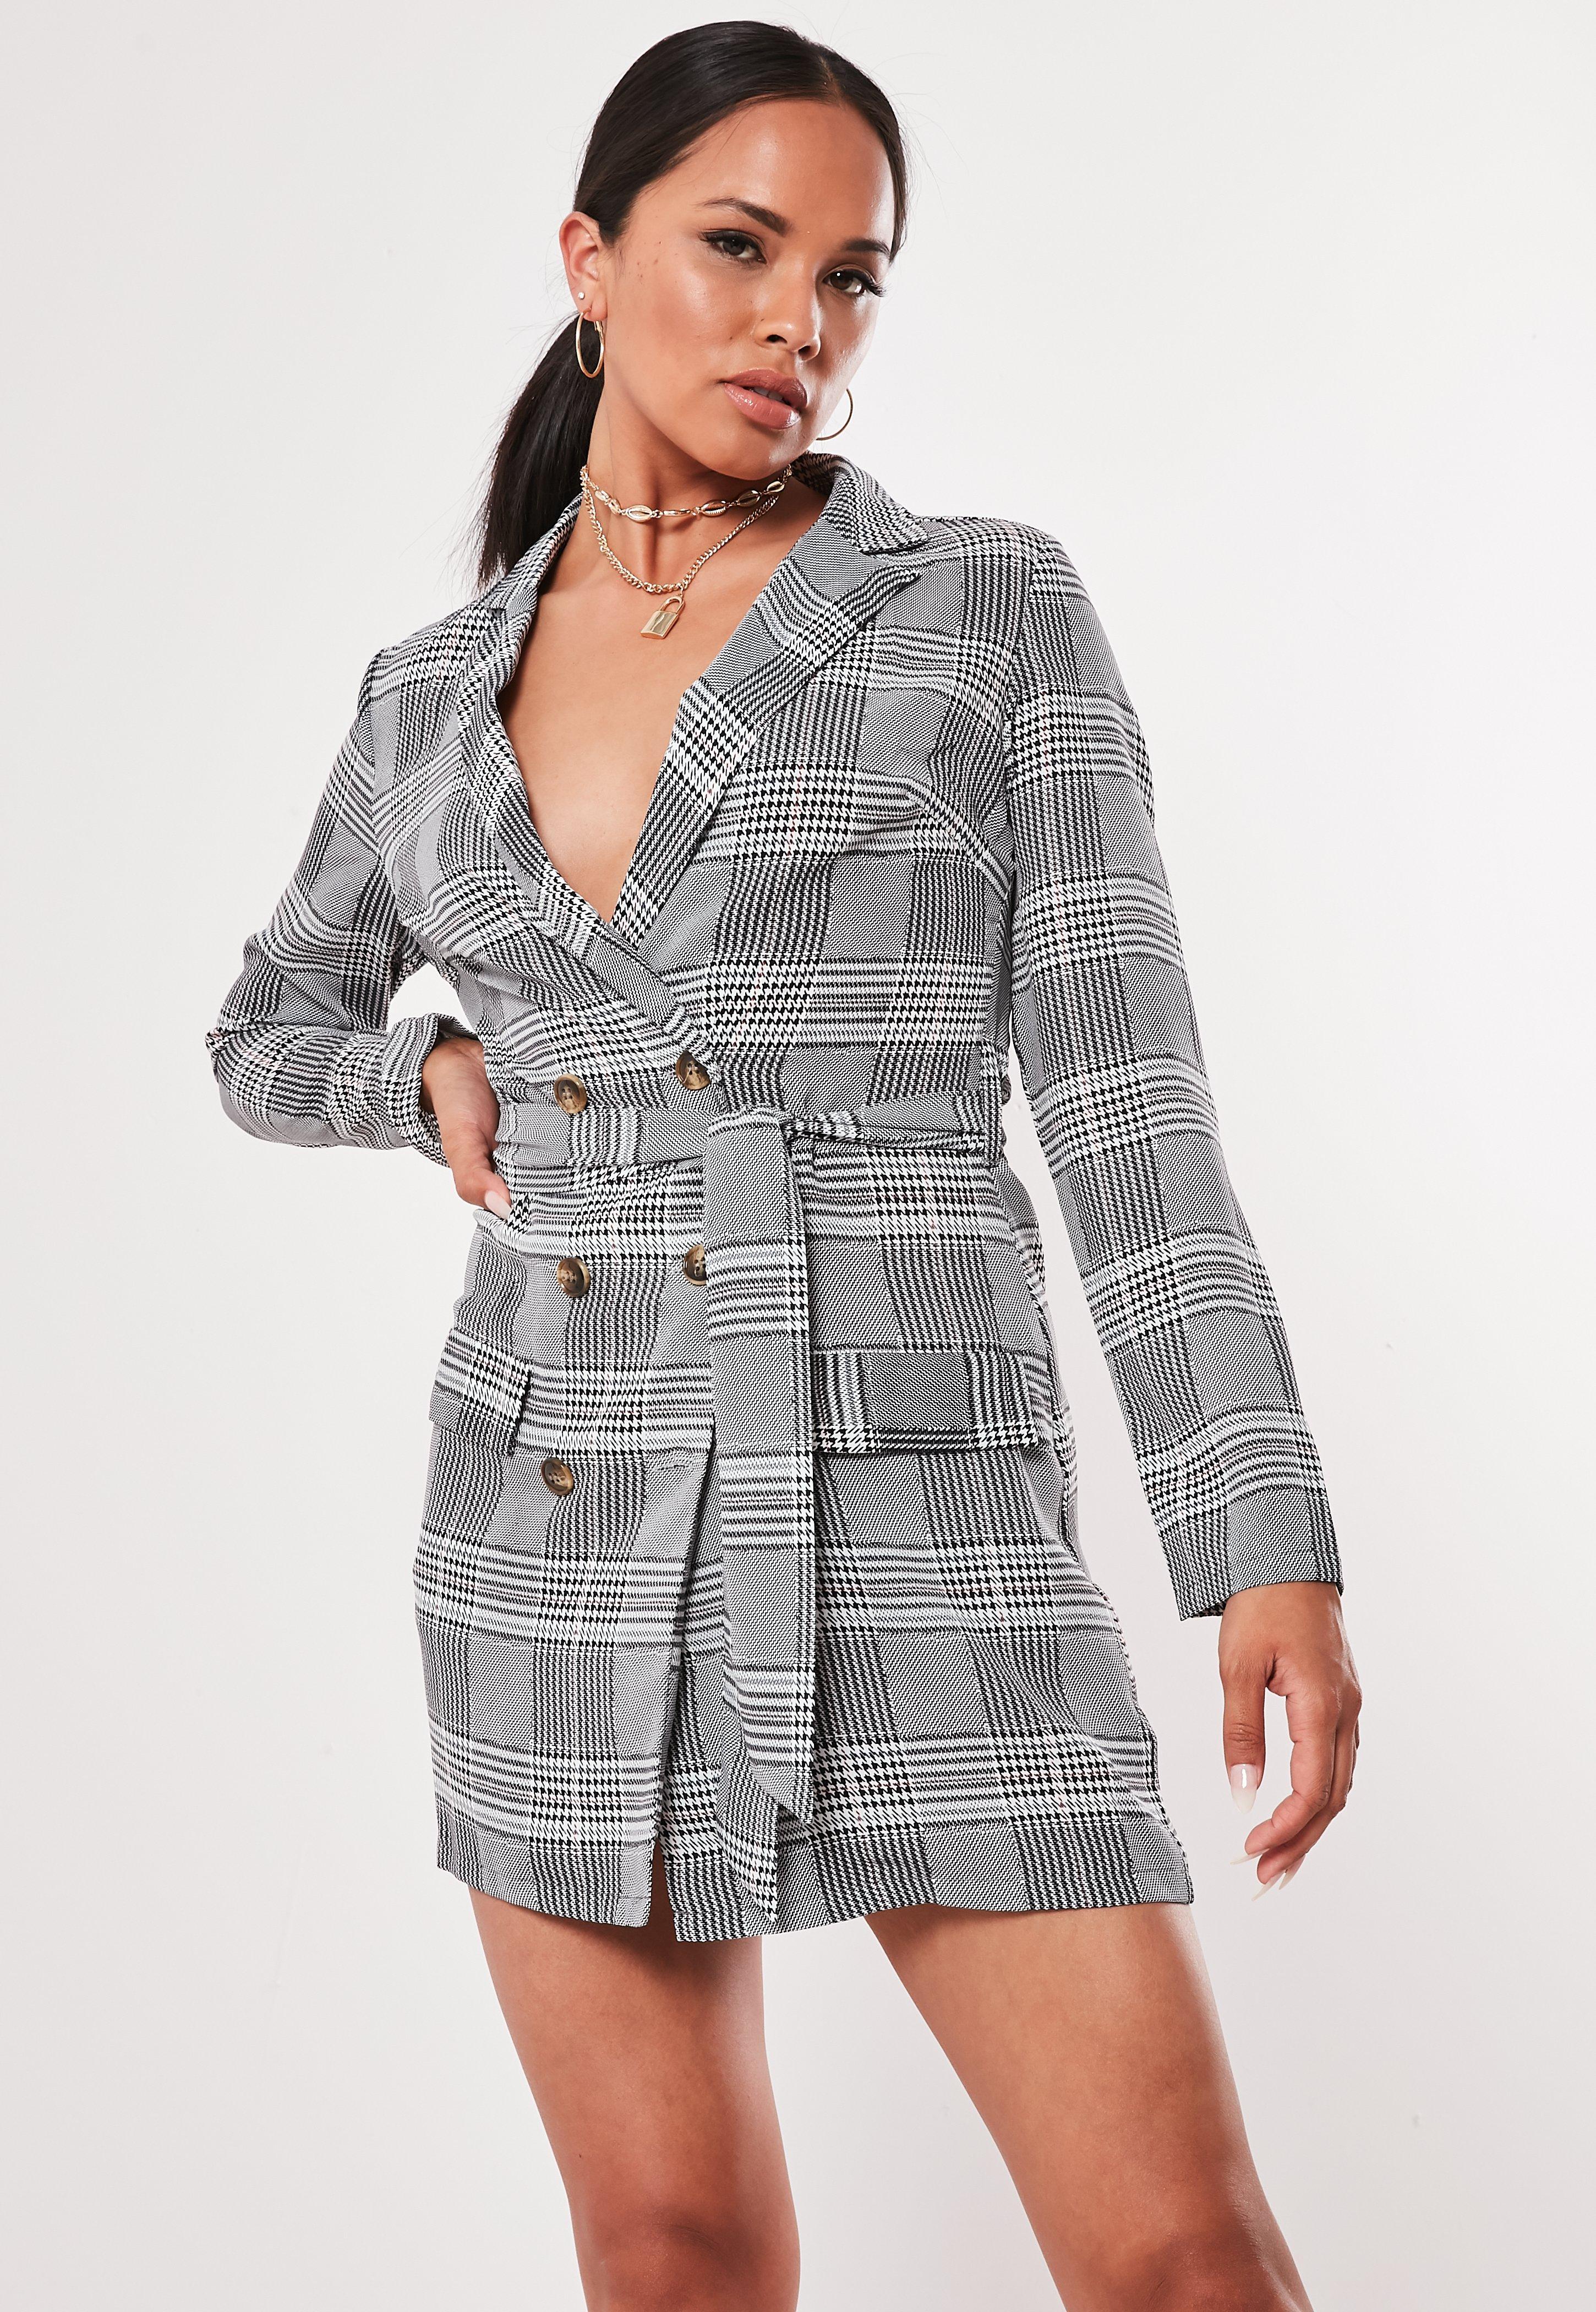 223f575d7ac3 Clothes Sale - Women's Cheap Clothes UK - Missguided